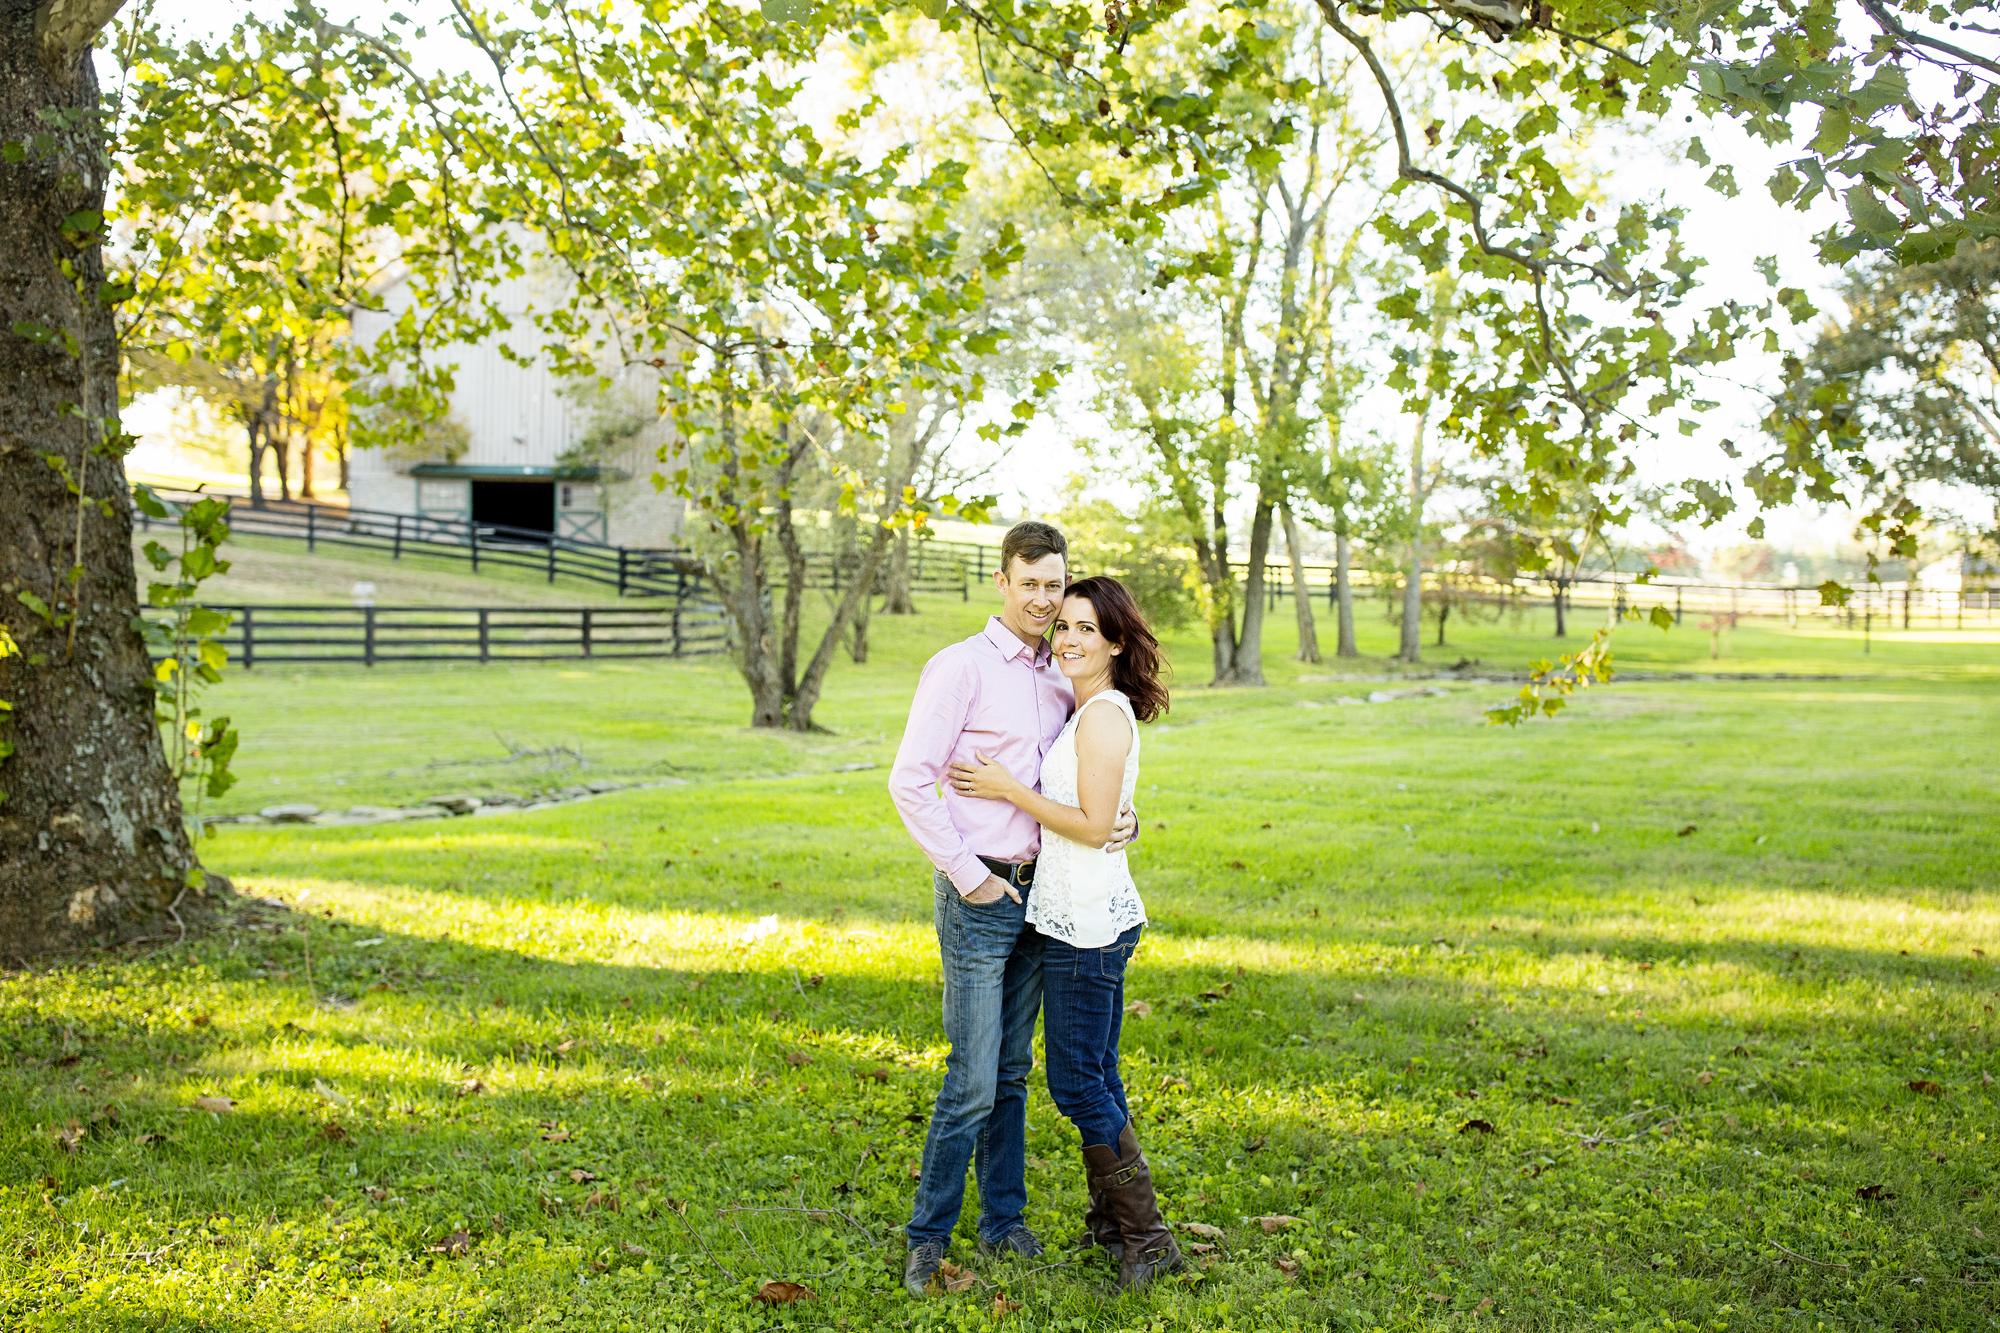 Seriously_Sabrina_Photography_Lexington_Kentucky_Burl_Winstar_Farm_Engagement_AliJerry_1.jpg